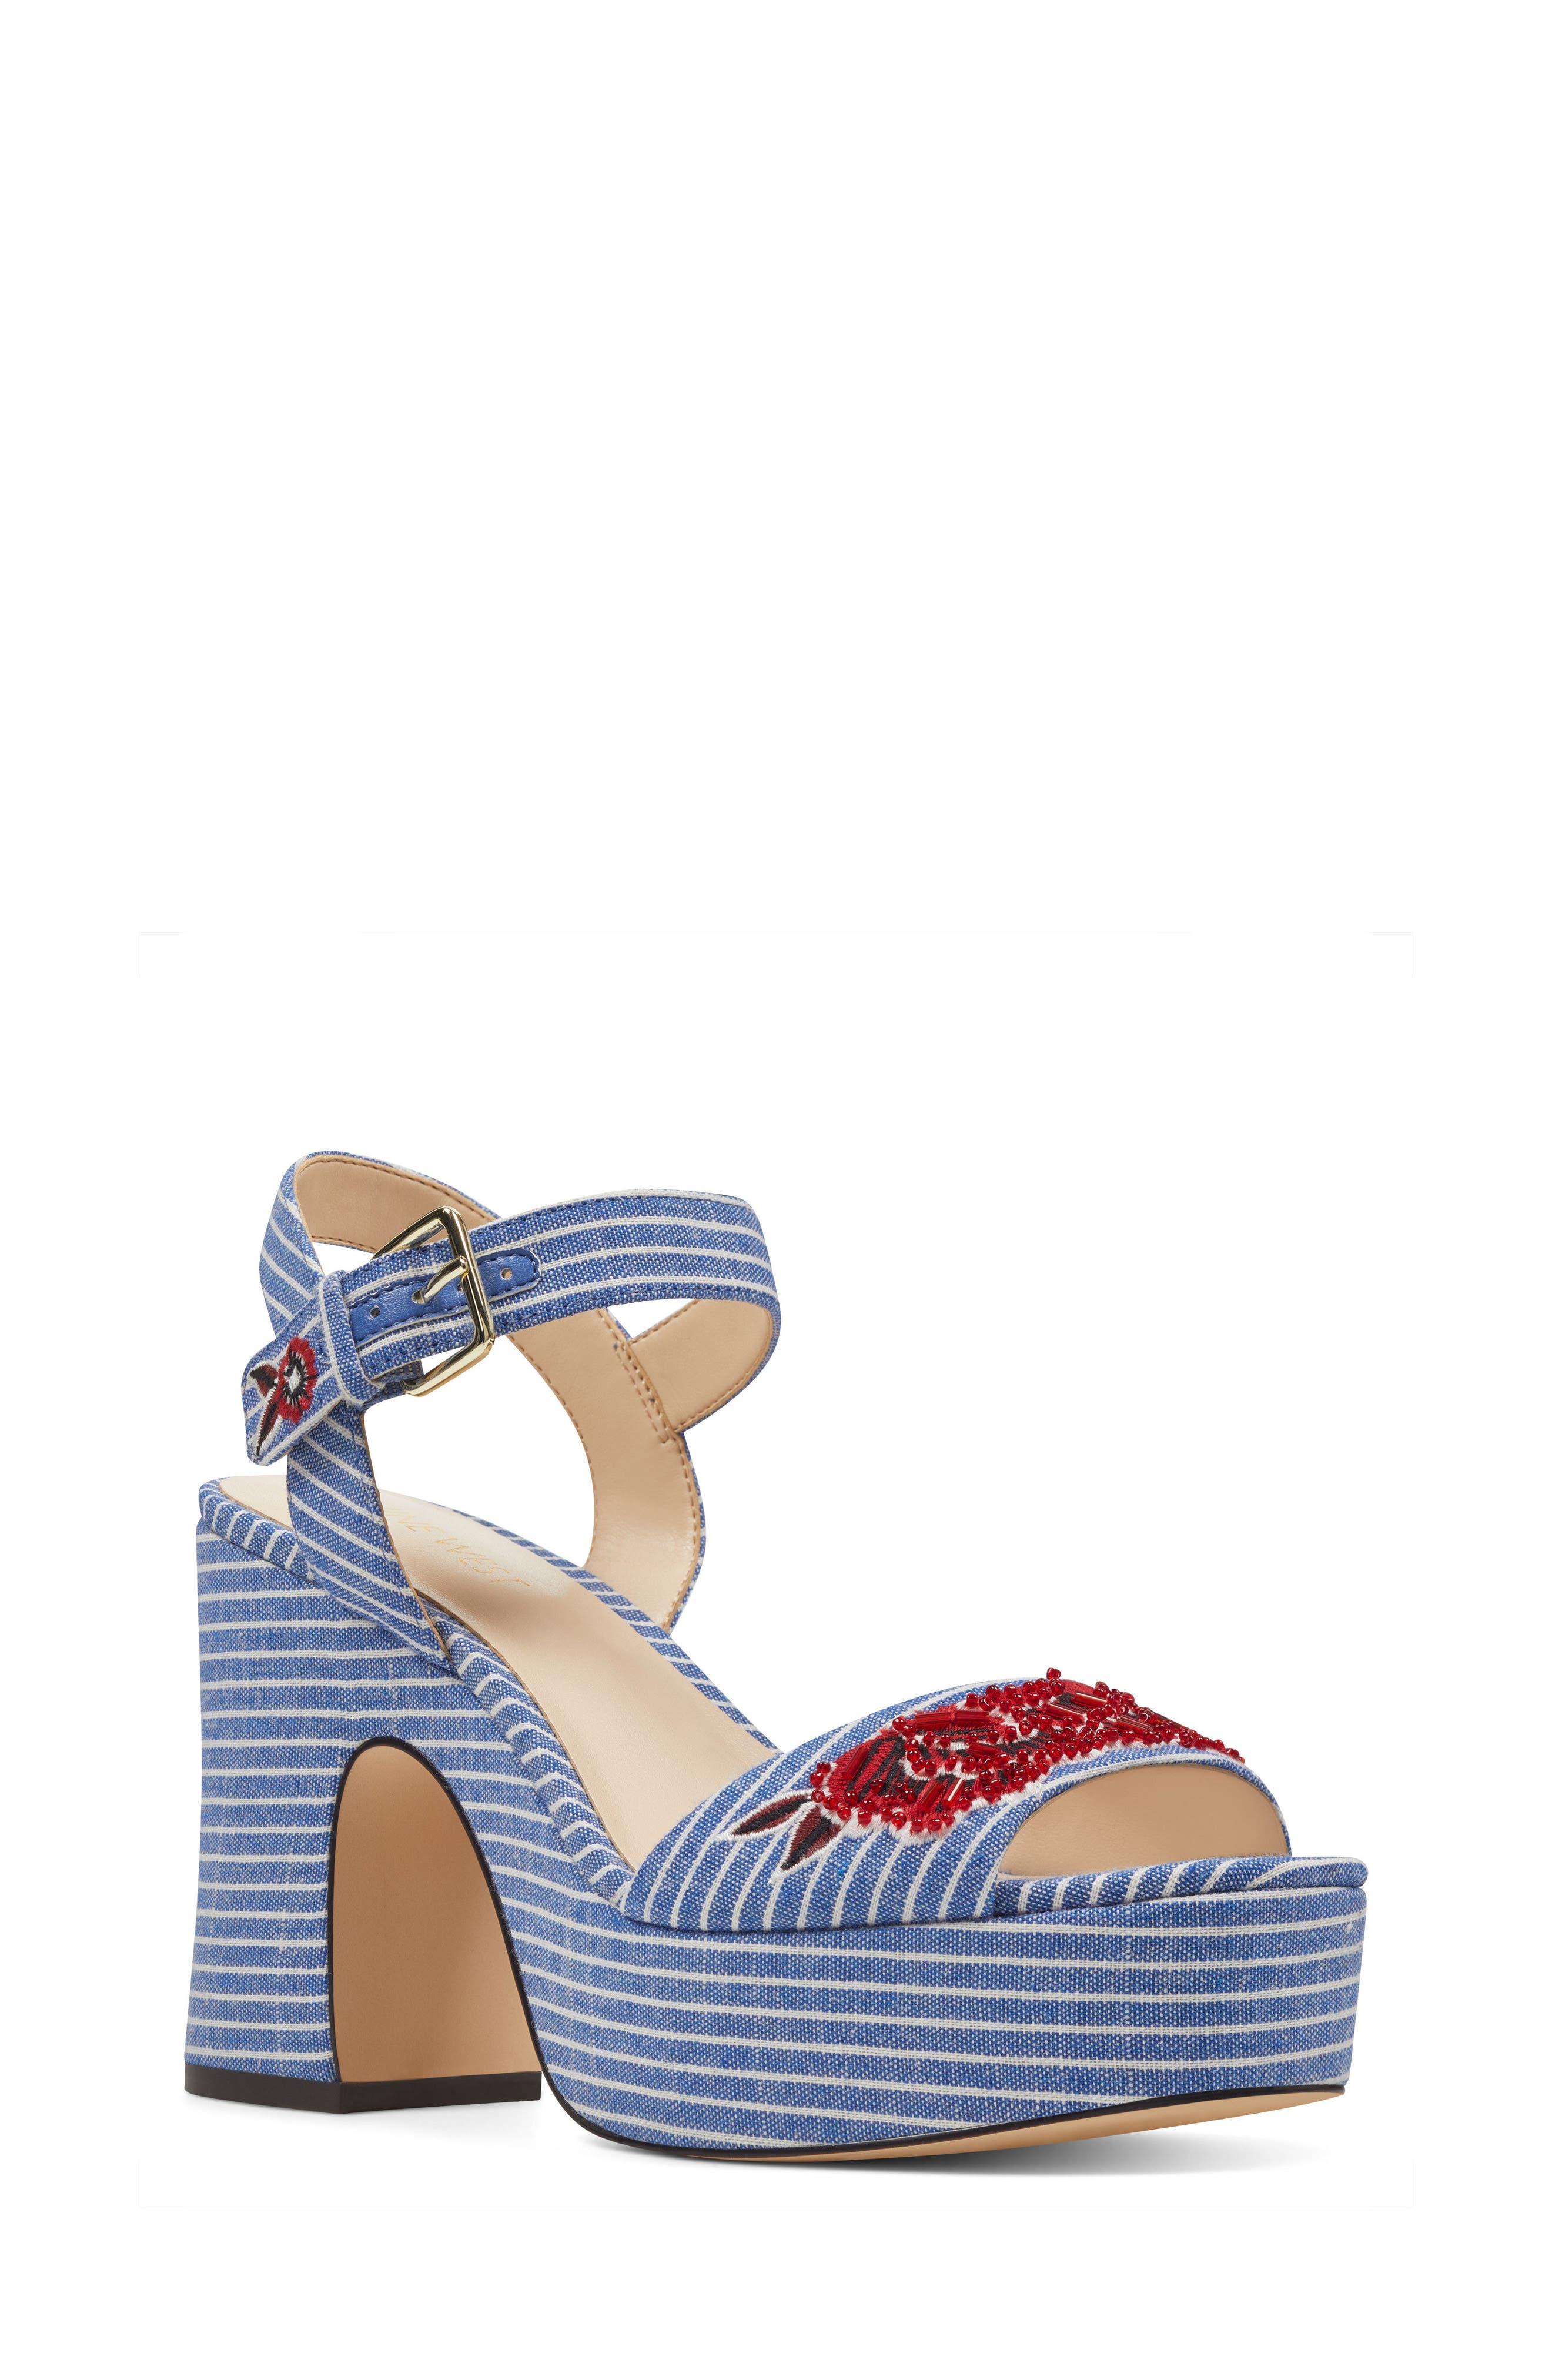 Fontayah Platform Sandal,                             Main thumbnail 1, color,                             Blue/ White Fabric